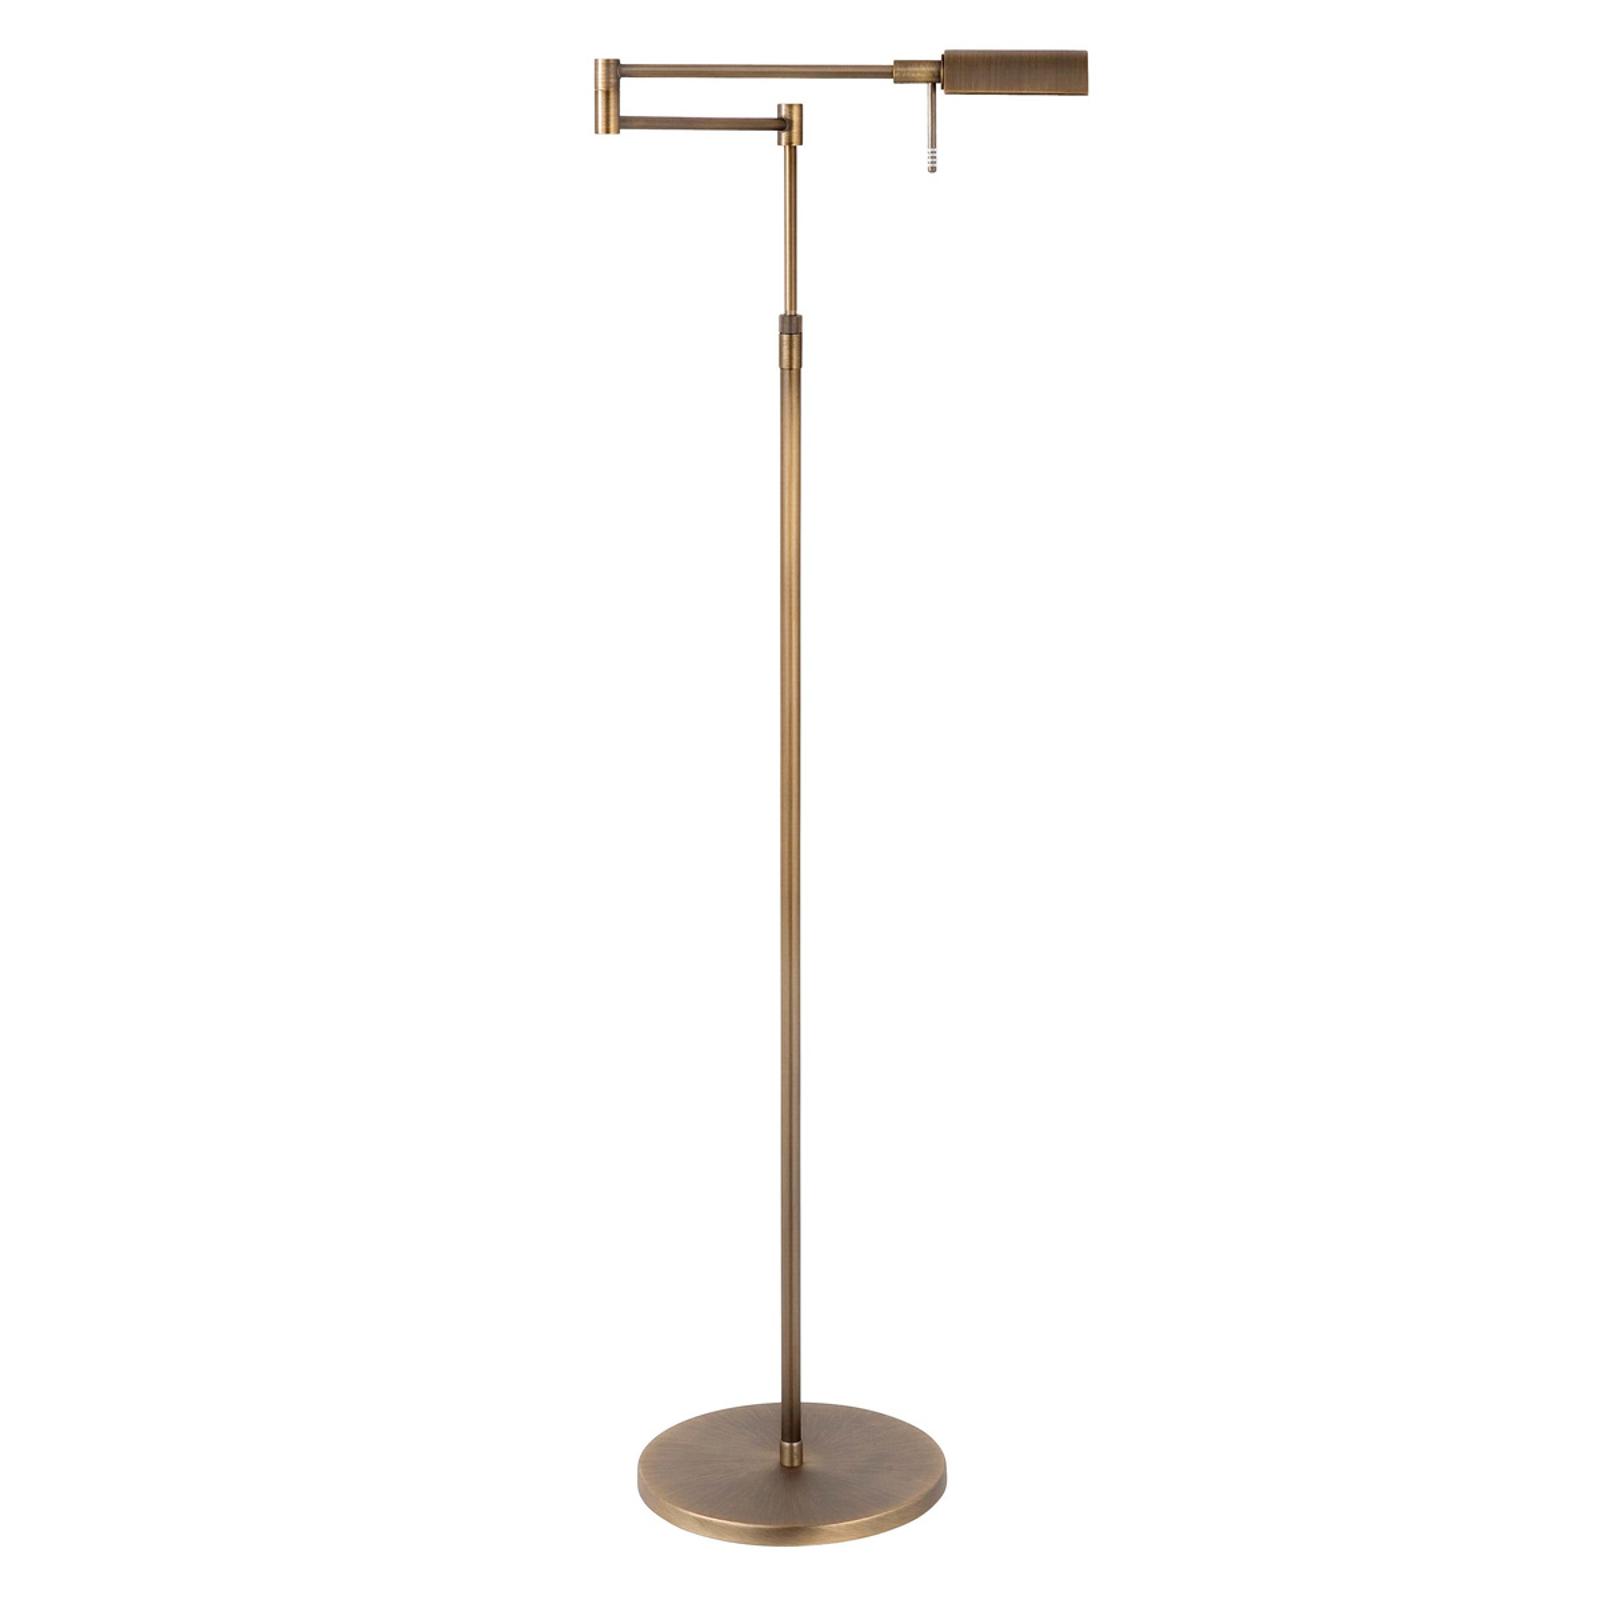 Klassische LED-Stehlampe New Bari